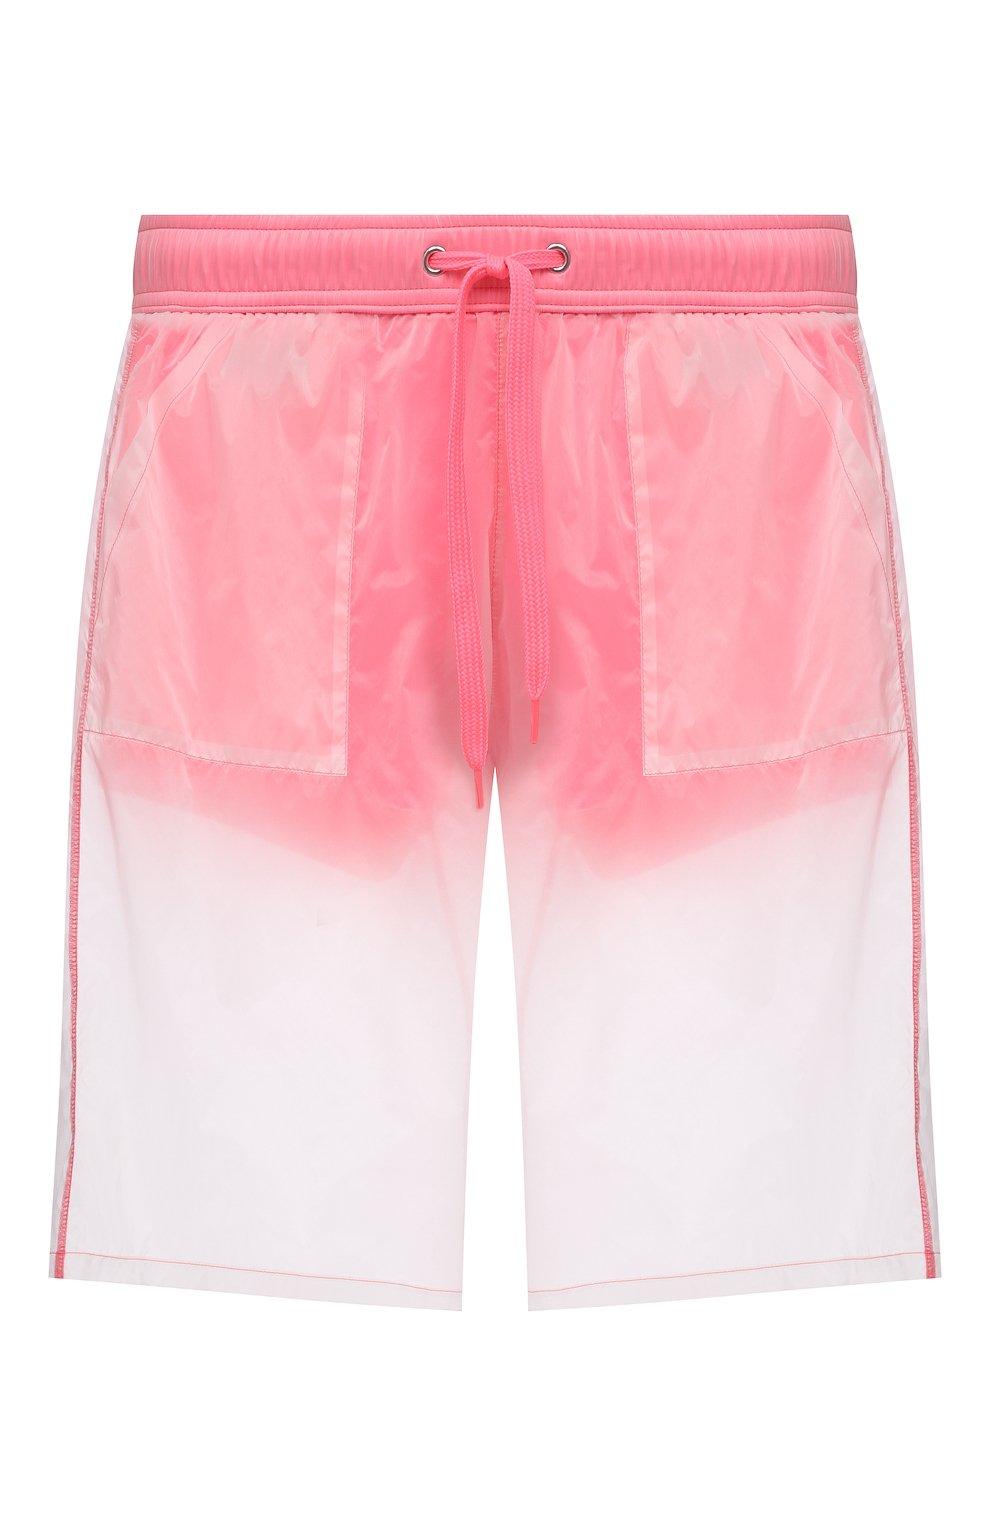 Мужские плавки-шорты MOSCHINO розового цвета, арт. A6164/2313   Фото 1 (Принт: Без принта; Материал внешний: Синтетический материал; Мужское Кросс-КТ: плавки-шорты)